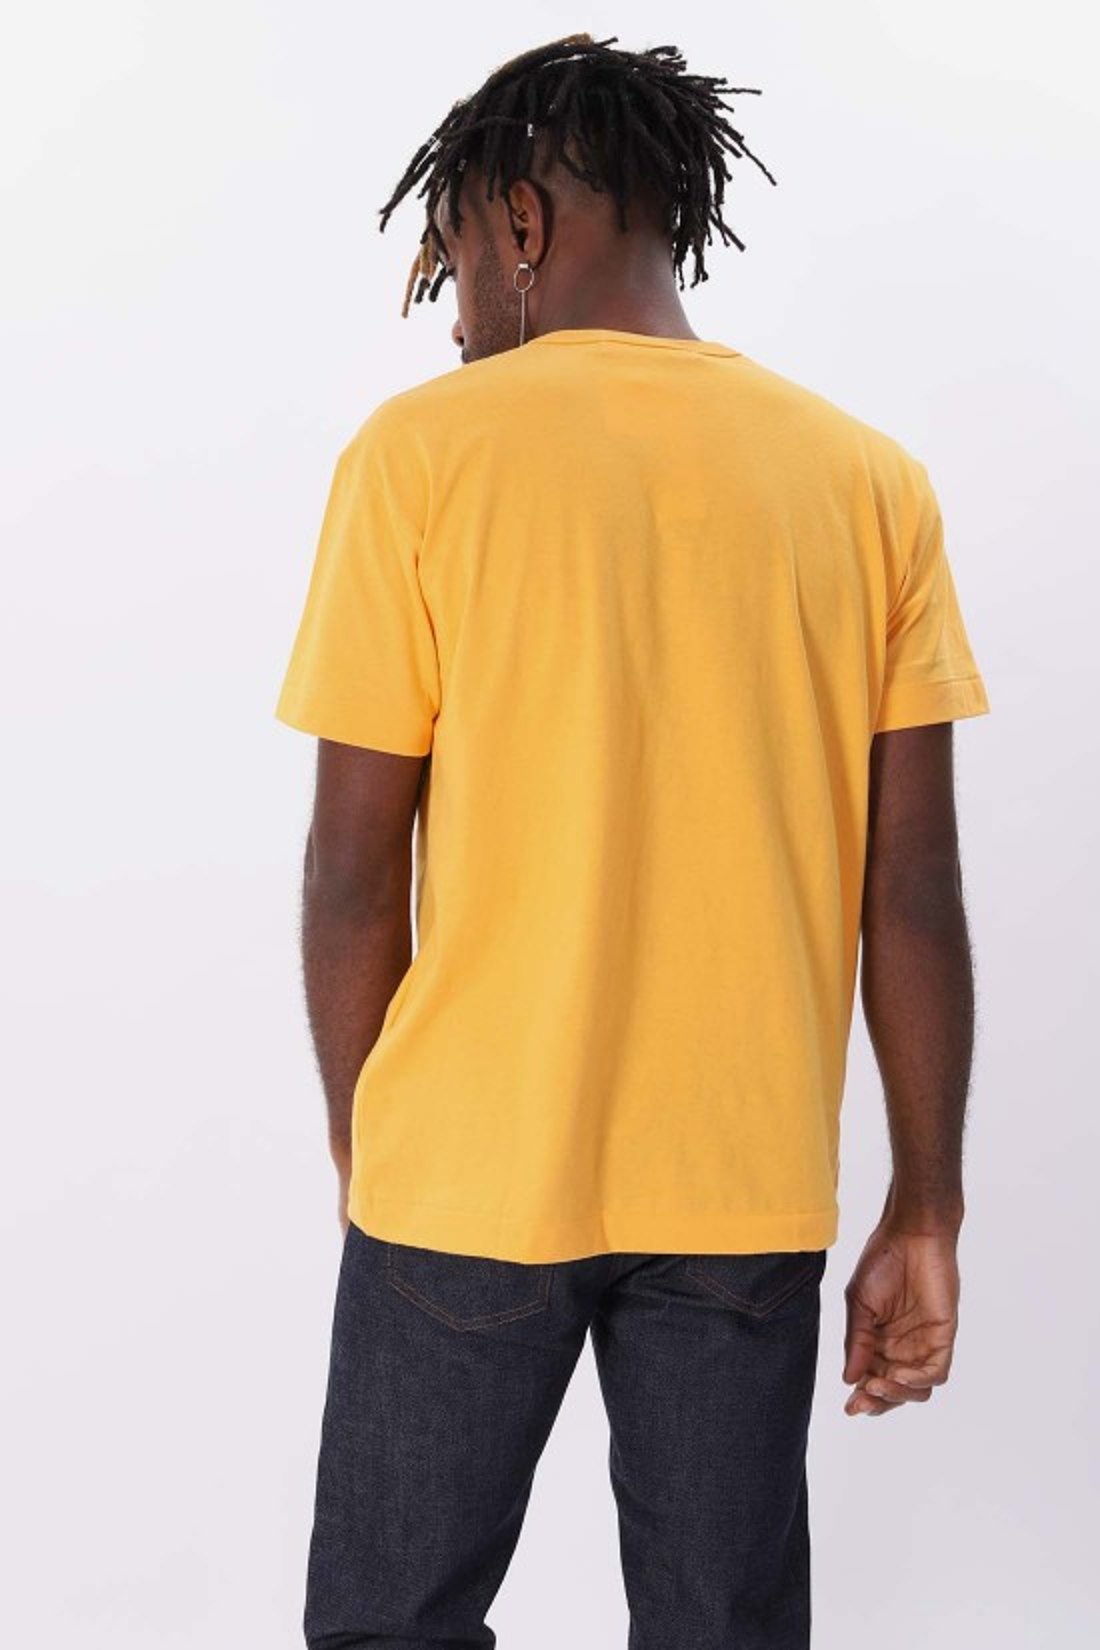 COMME DES GARÇONS PLAY / Red play t-shirt Yellow